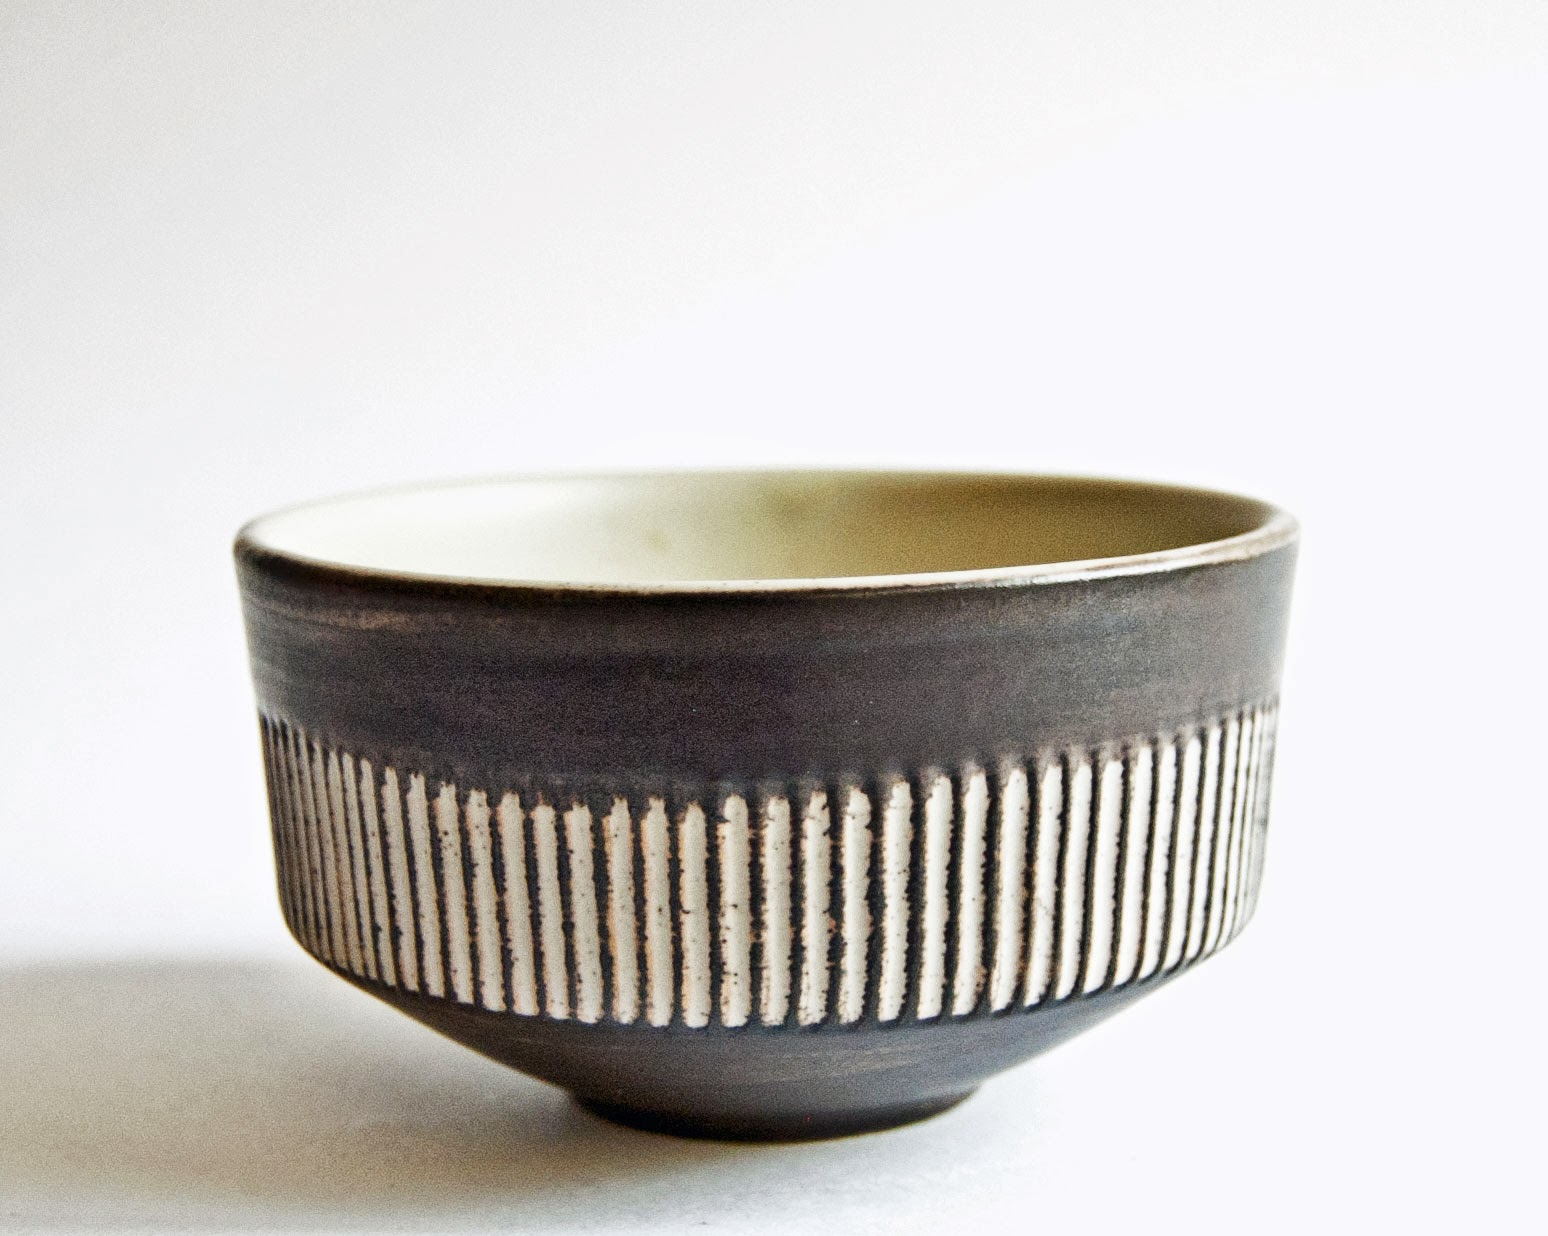 Displaying 16 gt  Images For - Japanese Ceramic Mugs   Japanese Ceramic Mugs